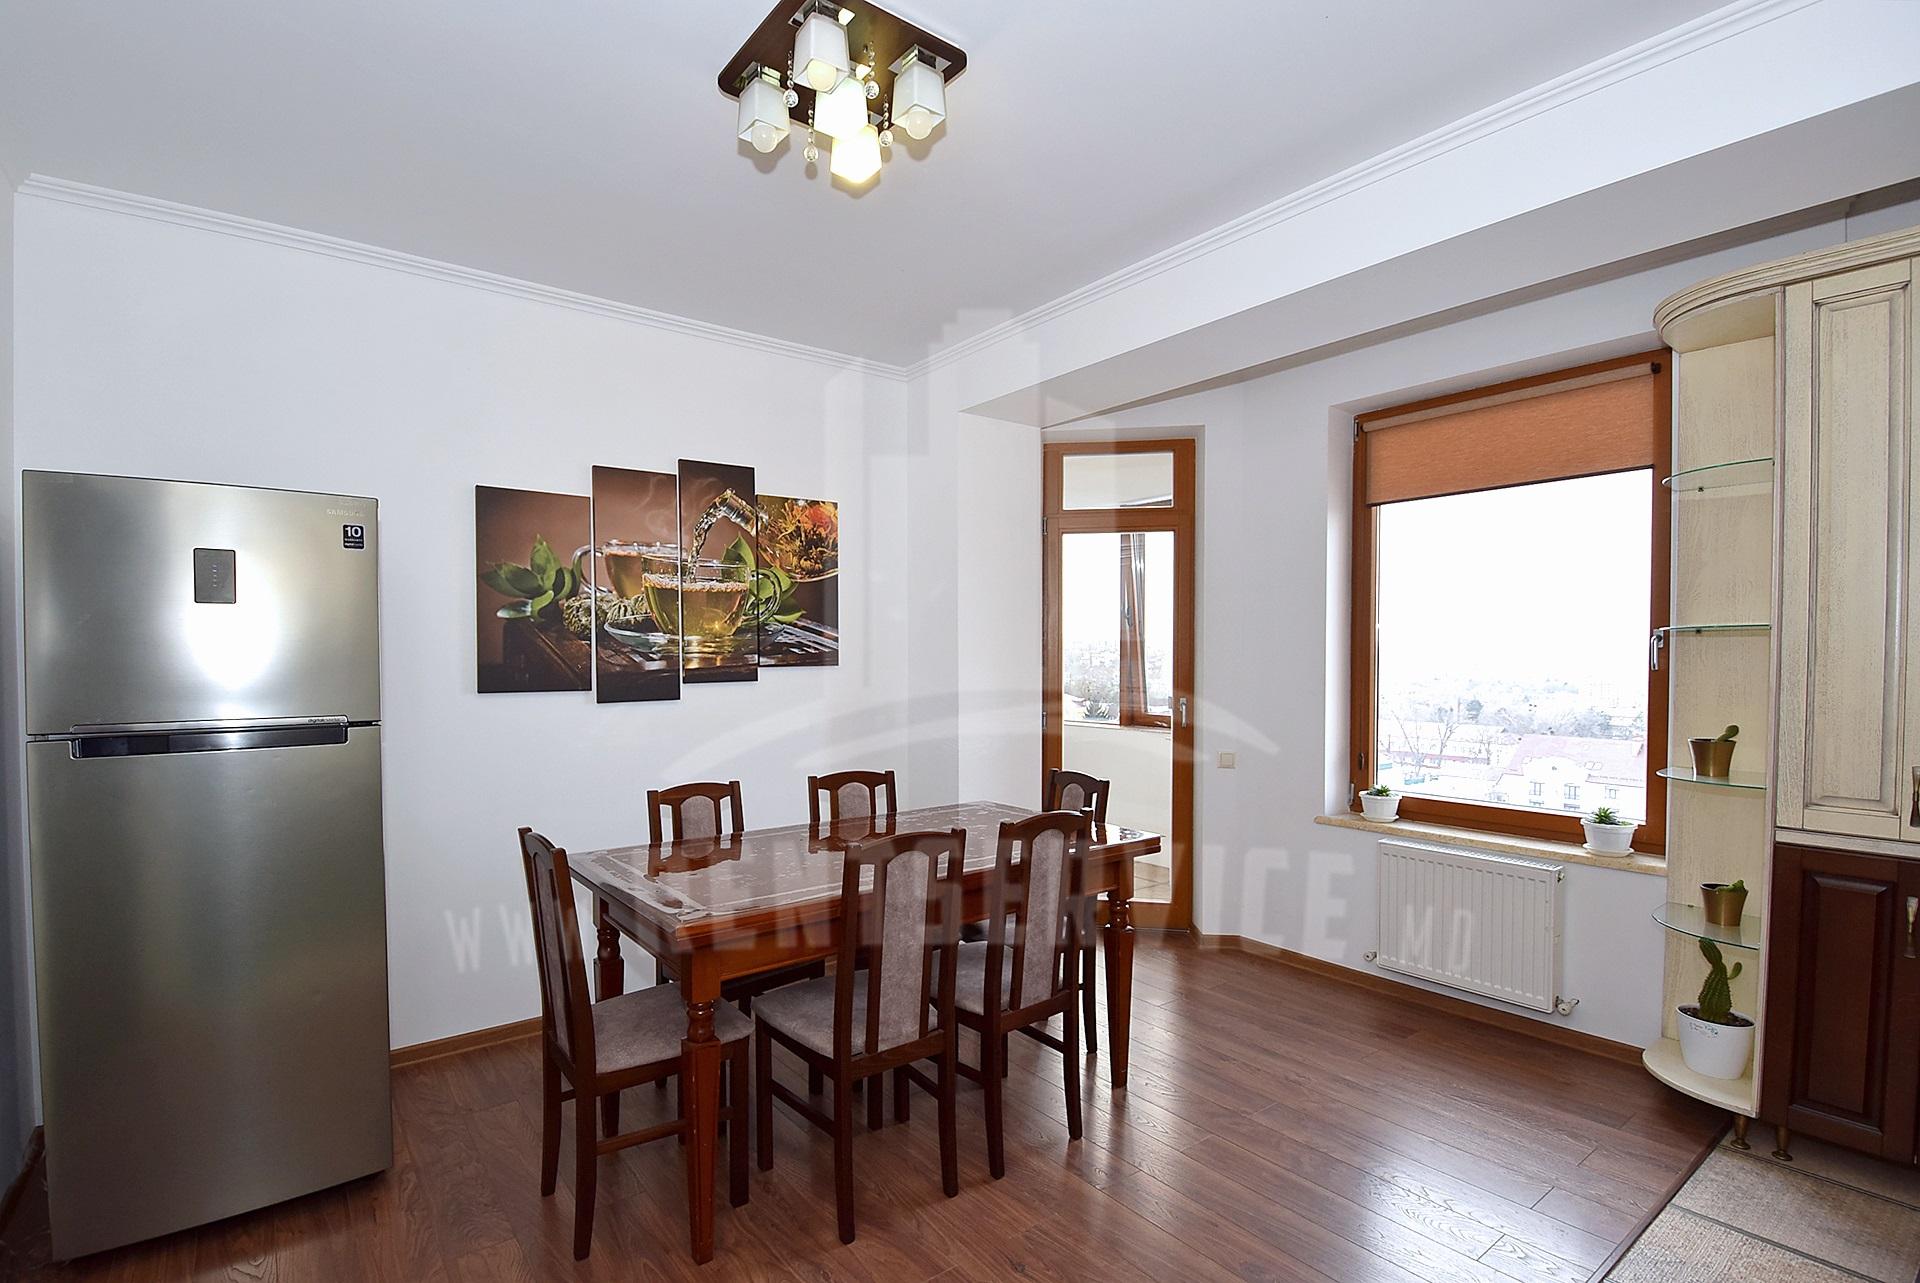 287_apartment_6.JPG